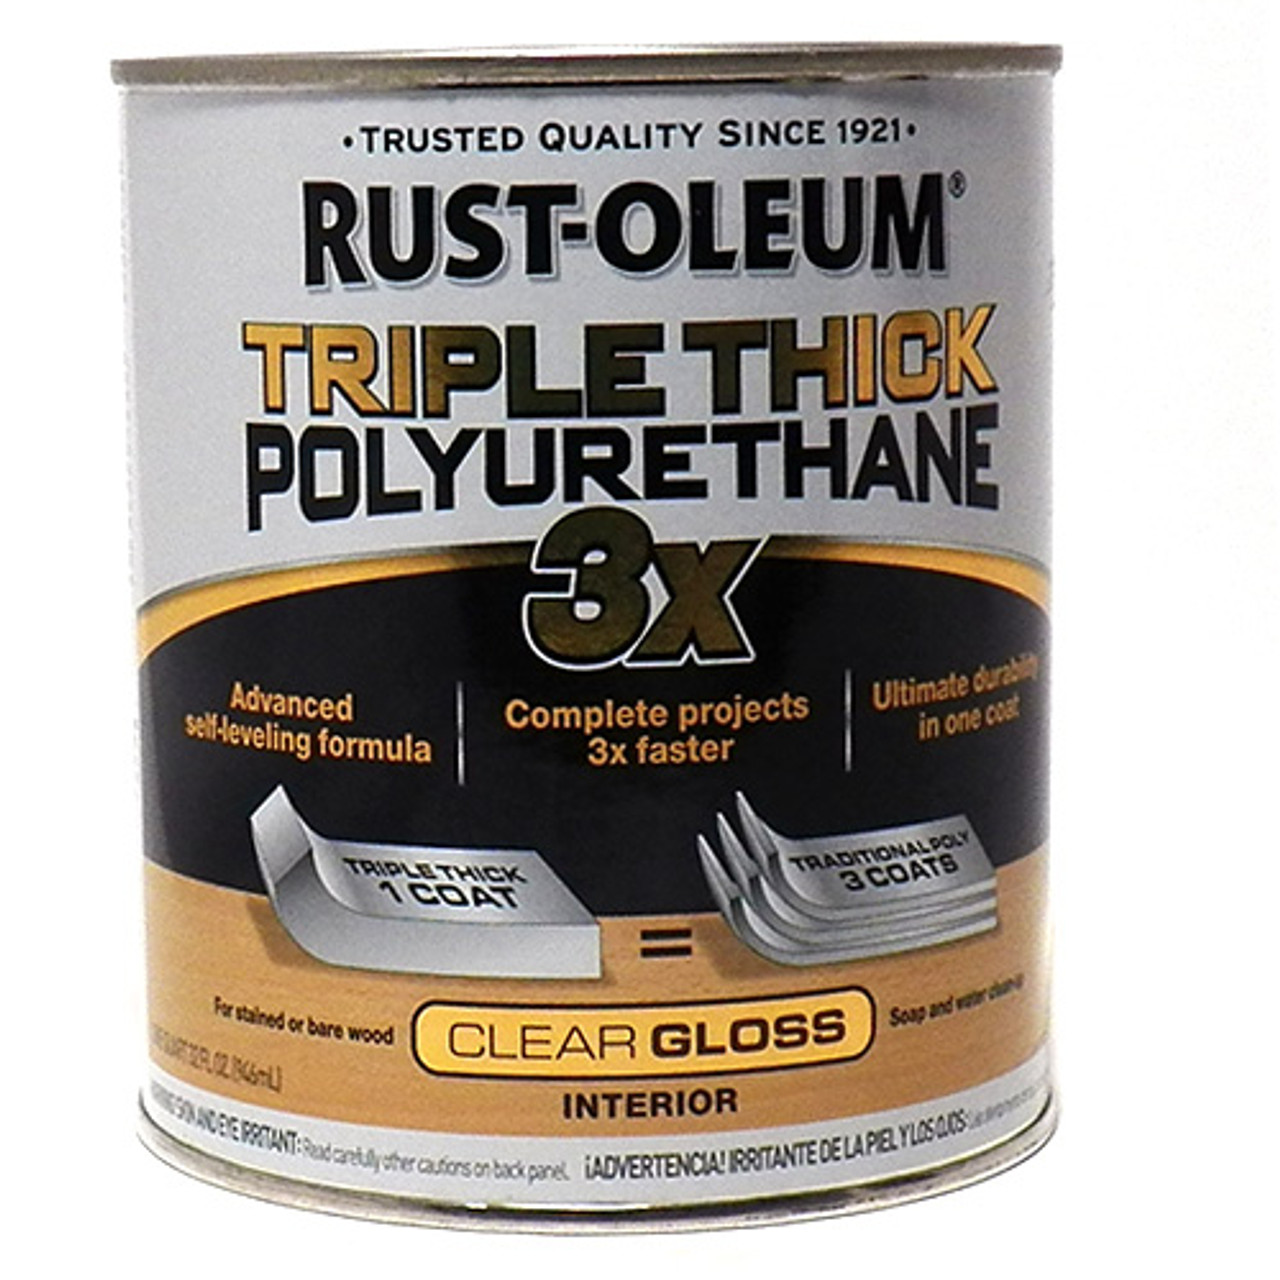 Rustoleum Triple Thick, Polyurethane, Gloss, Quart